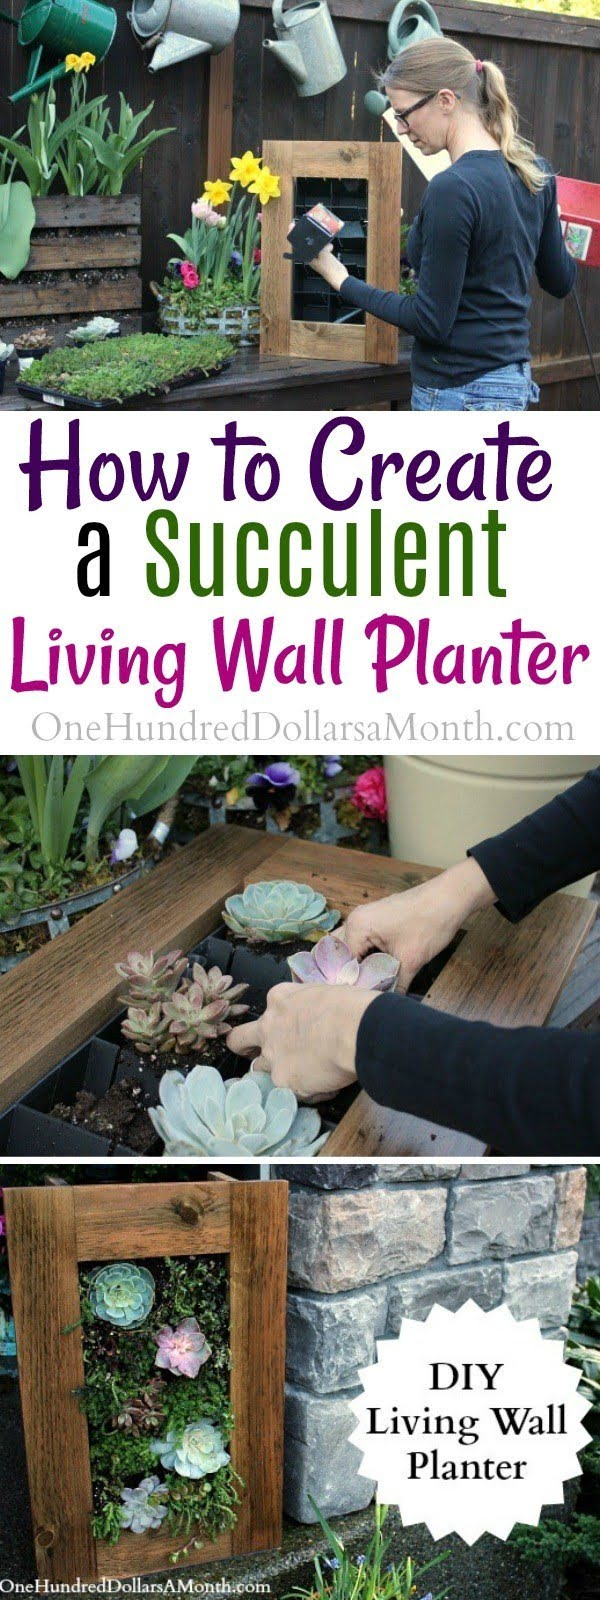 DIY Sedum and Succulent Living Wall Planter